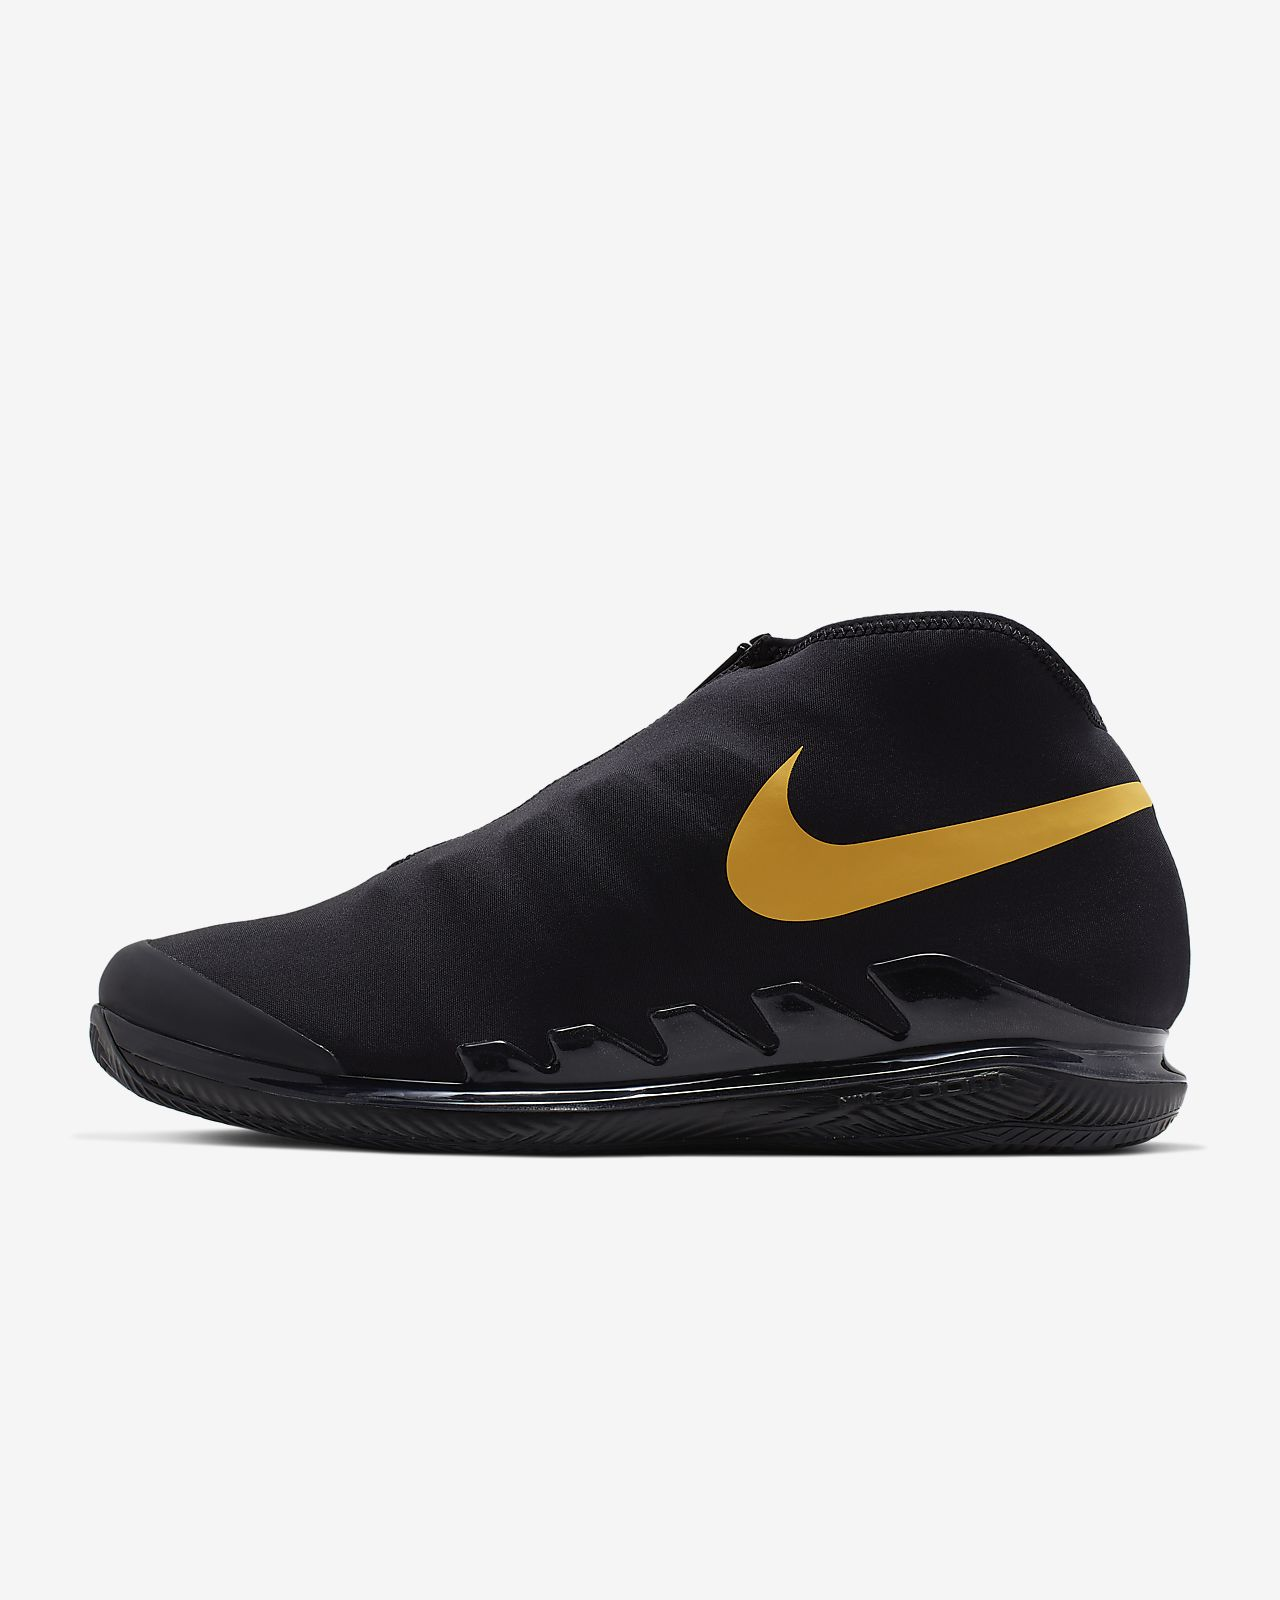 premium selection 40b3e 1bb9d ... Scarpa da tennis per campi in terra rossa NikeCourt Air Zoom Vapor X  Glove - Uomo